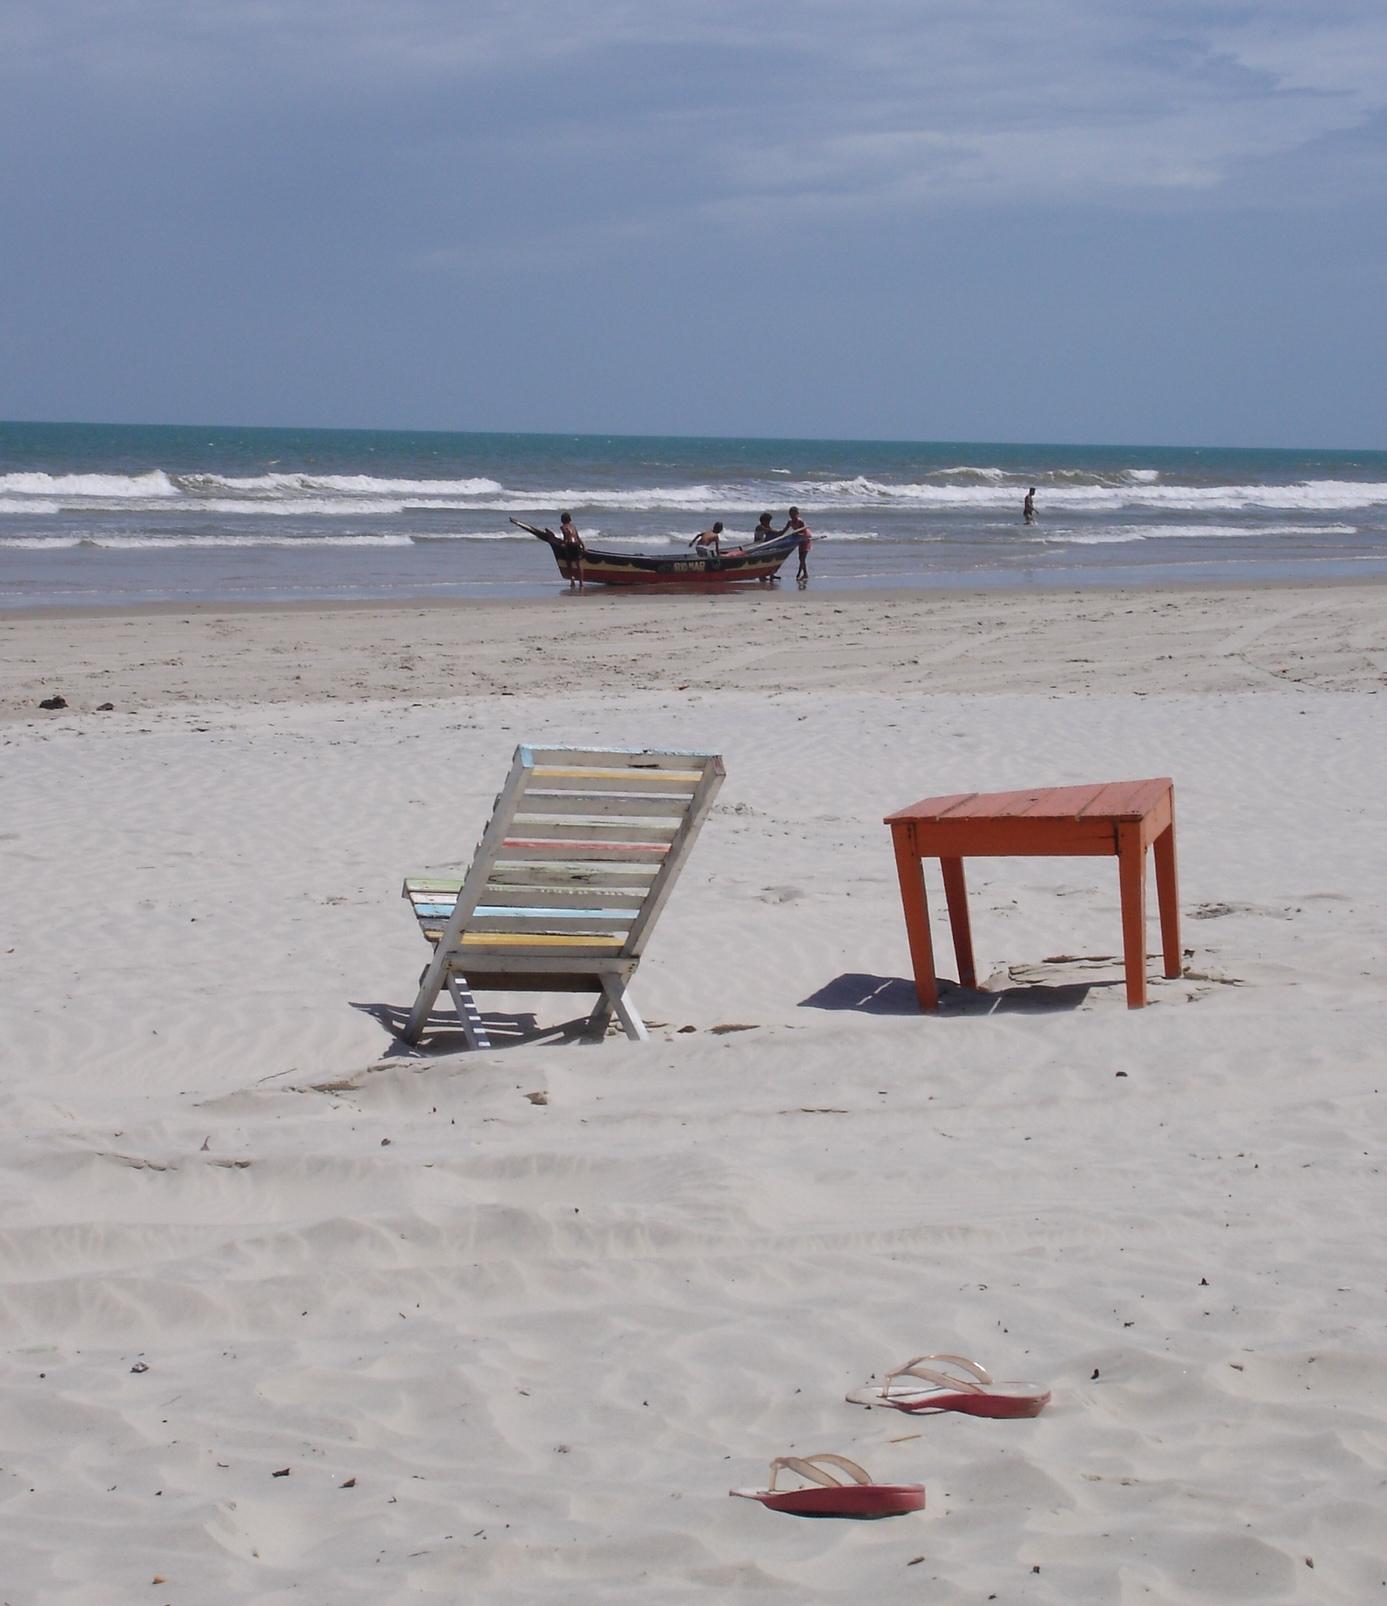 ocio da praia. Foto: GC/Blog Vambora!